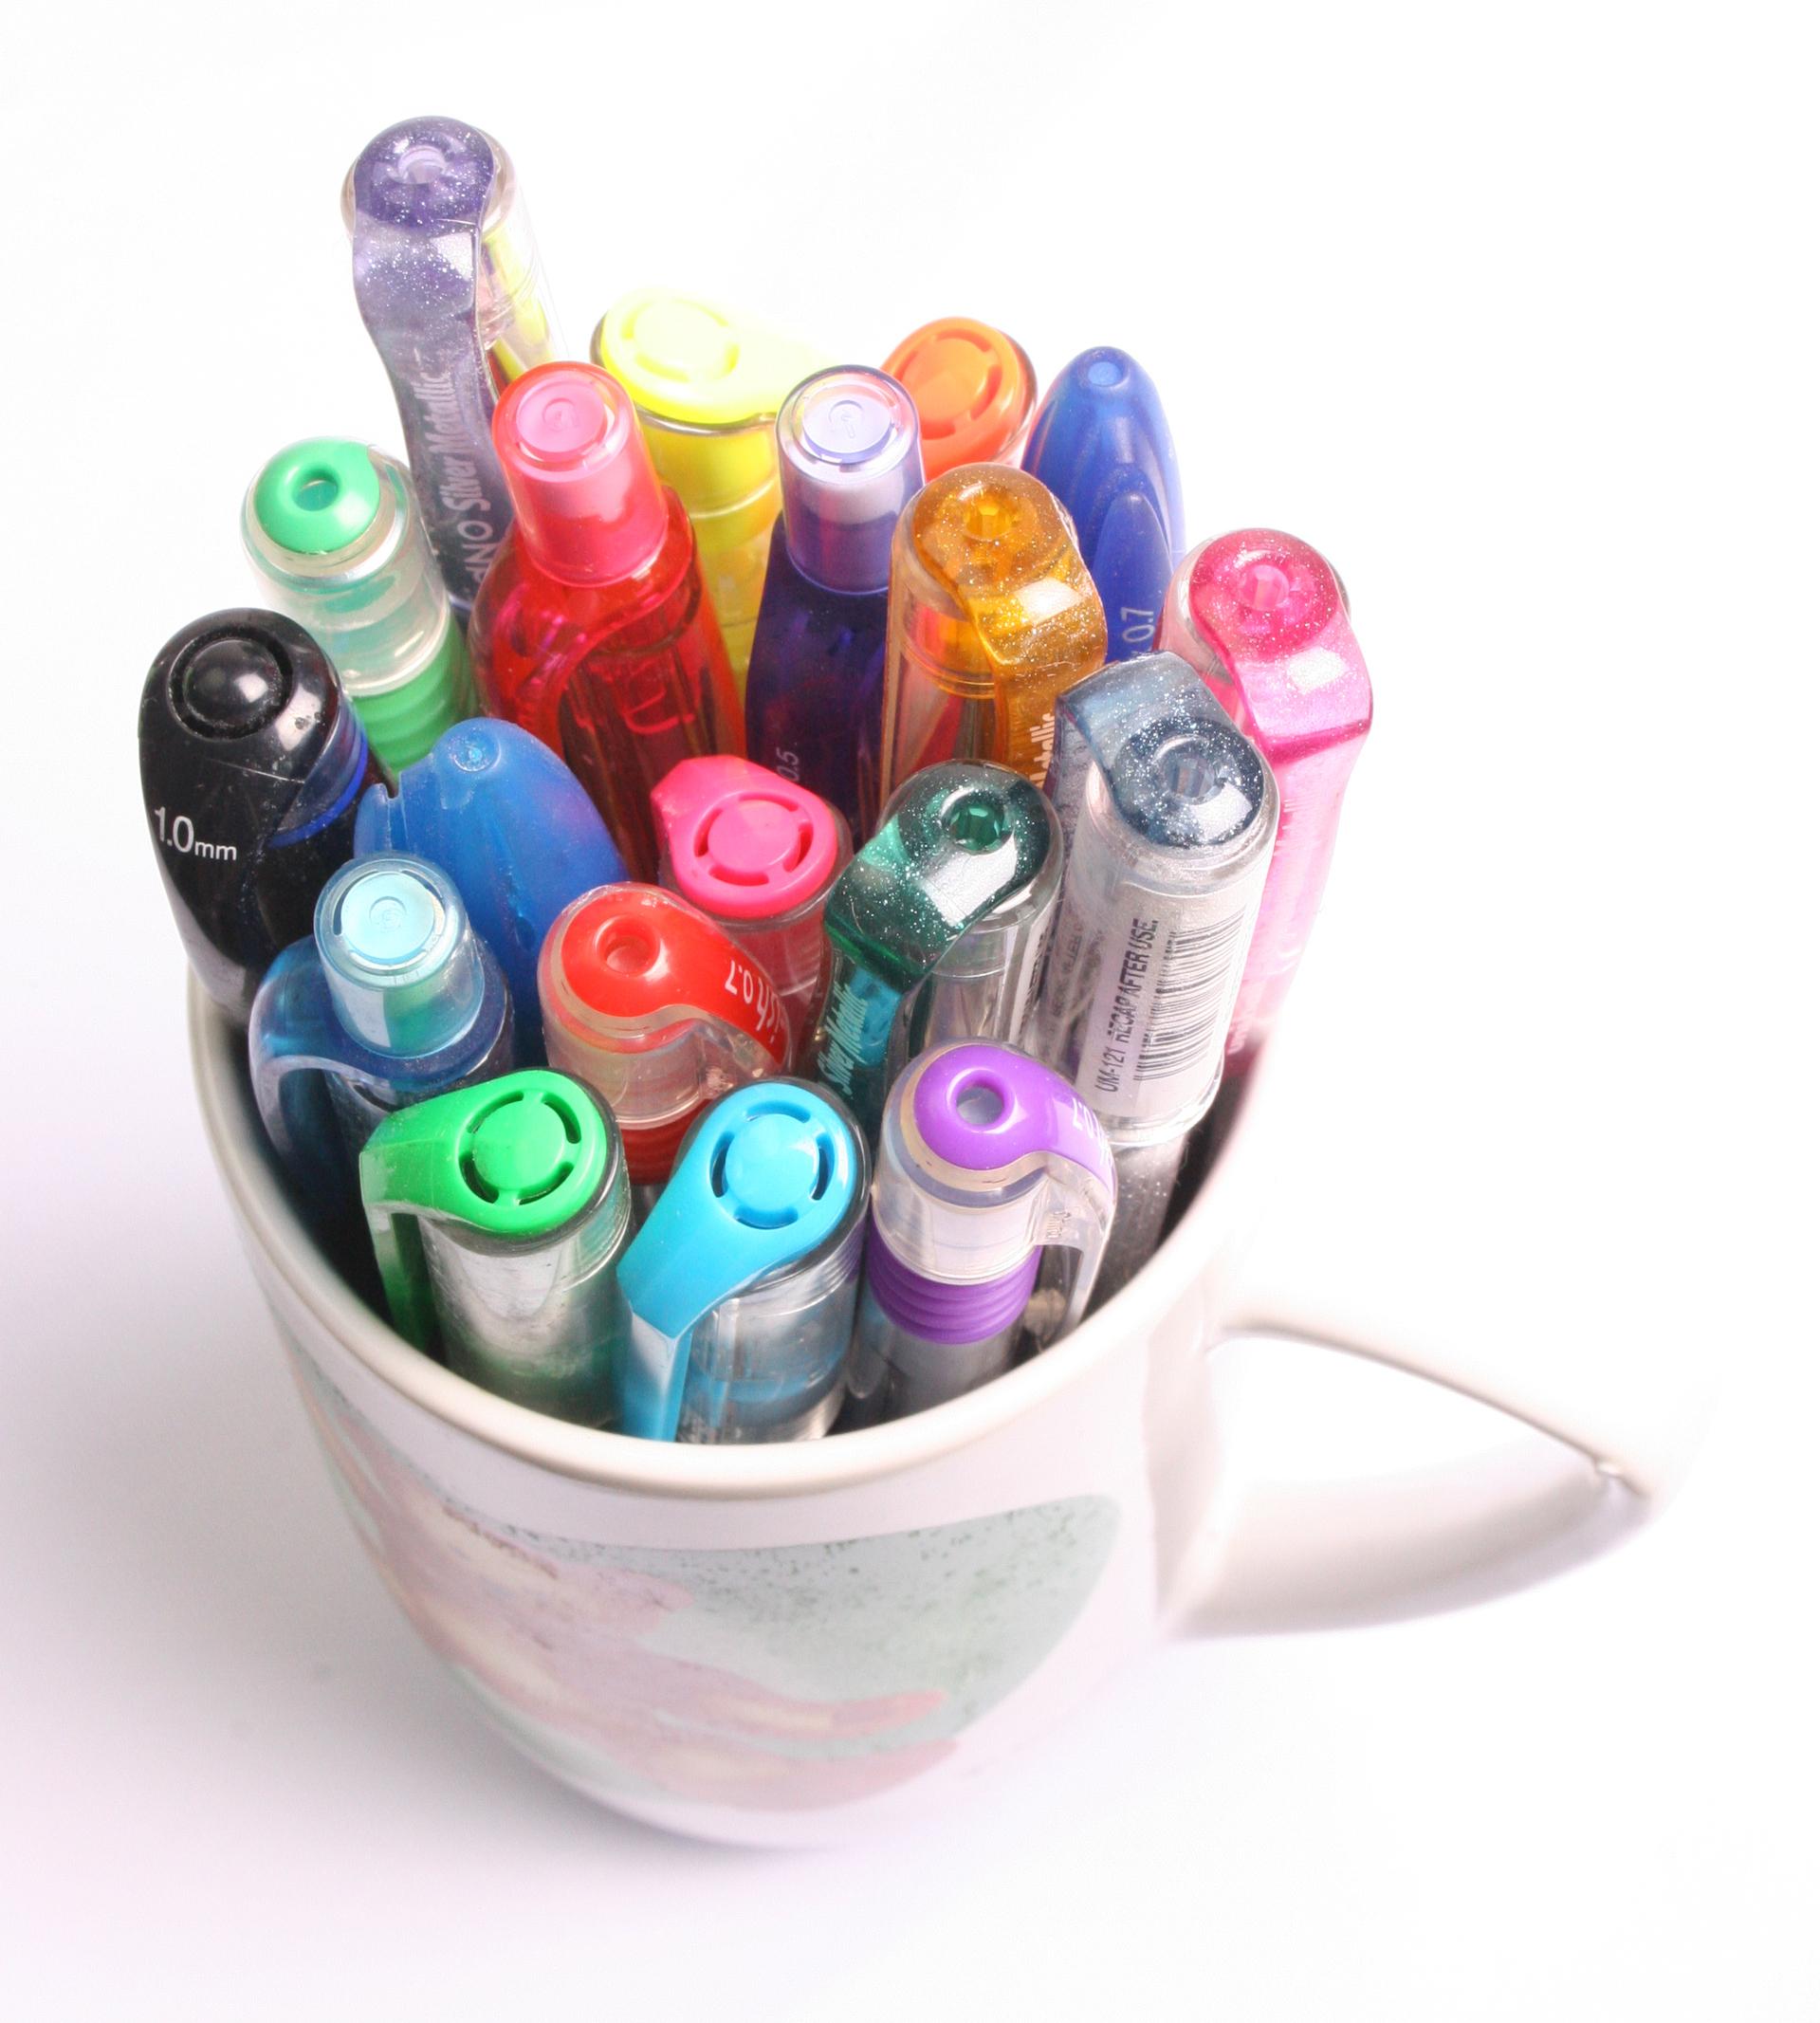 pens-1197384-1919x2133.jpg